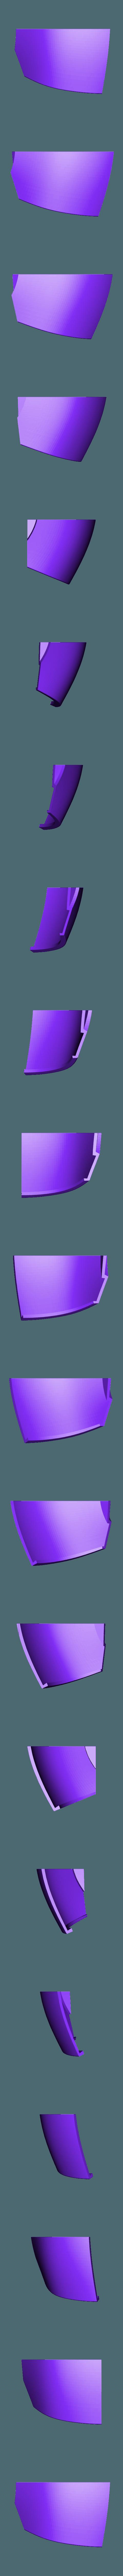 part 12.stl Download STL file Deathstroke Injustice Helmet • 3D printable model, VillainousPropShop